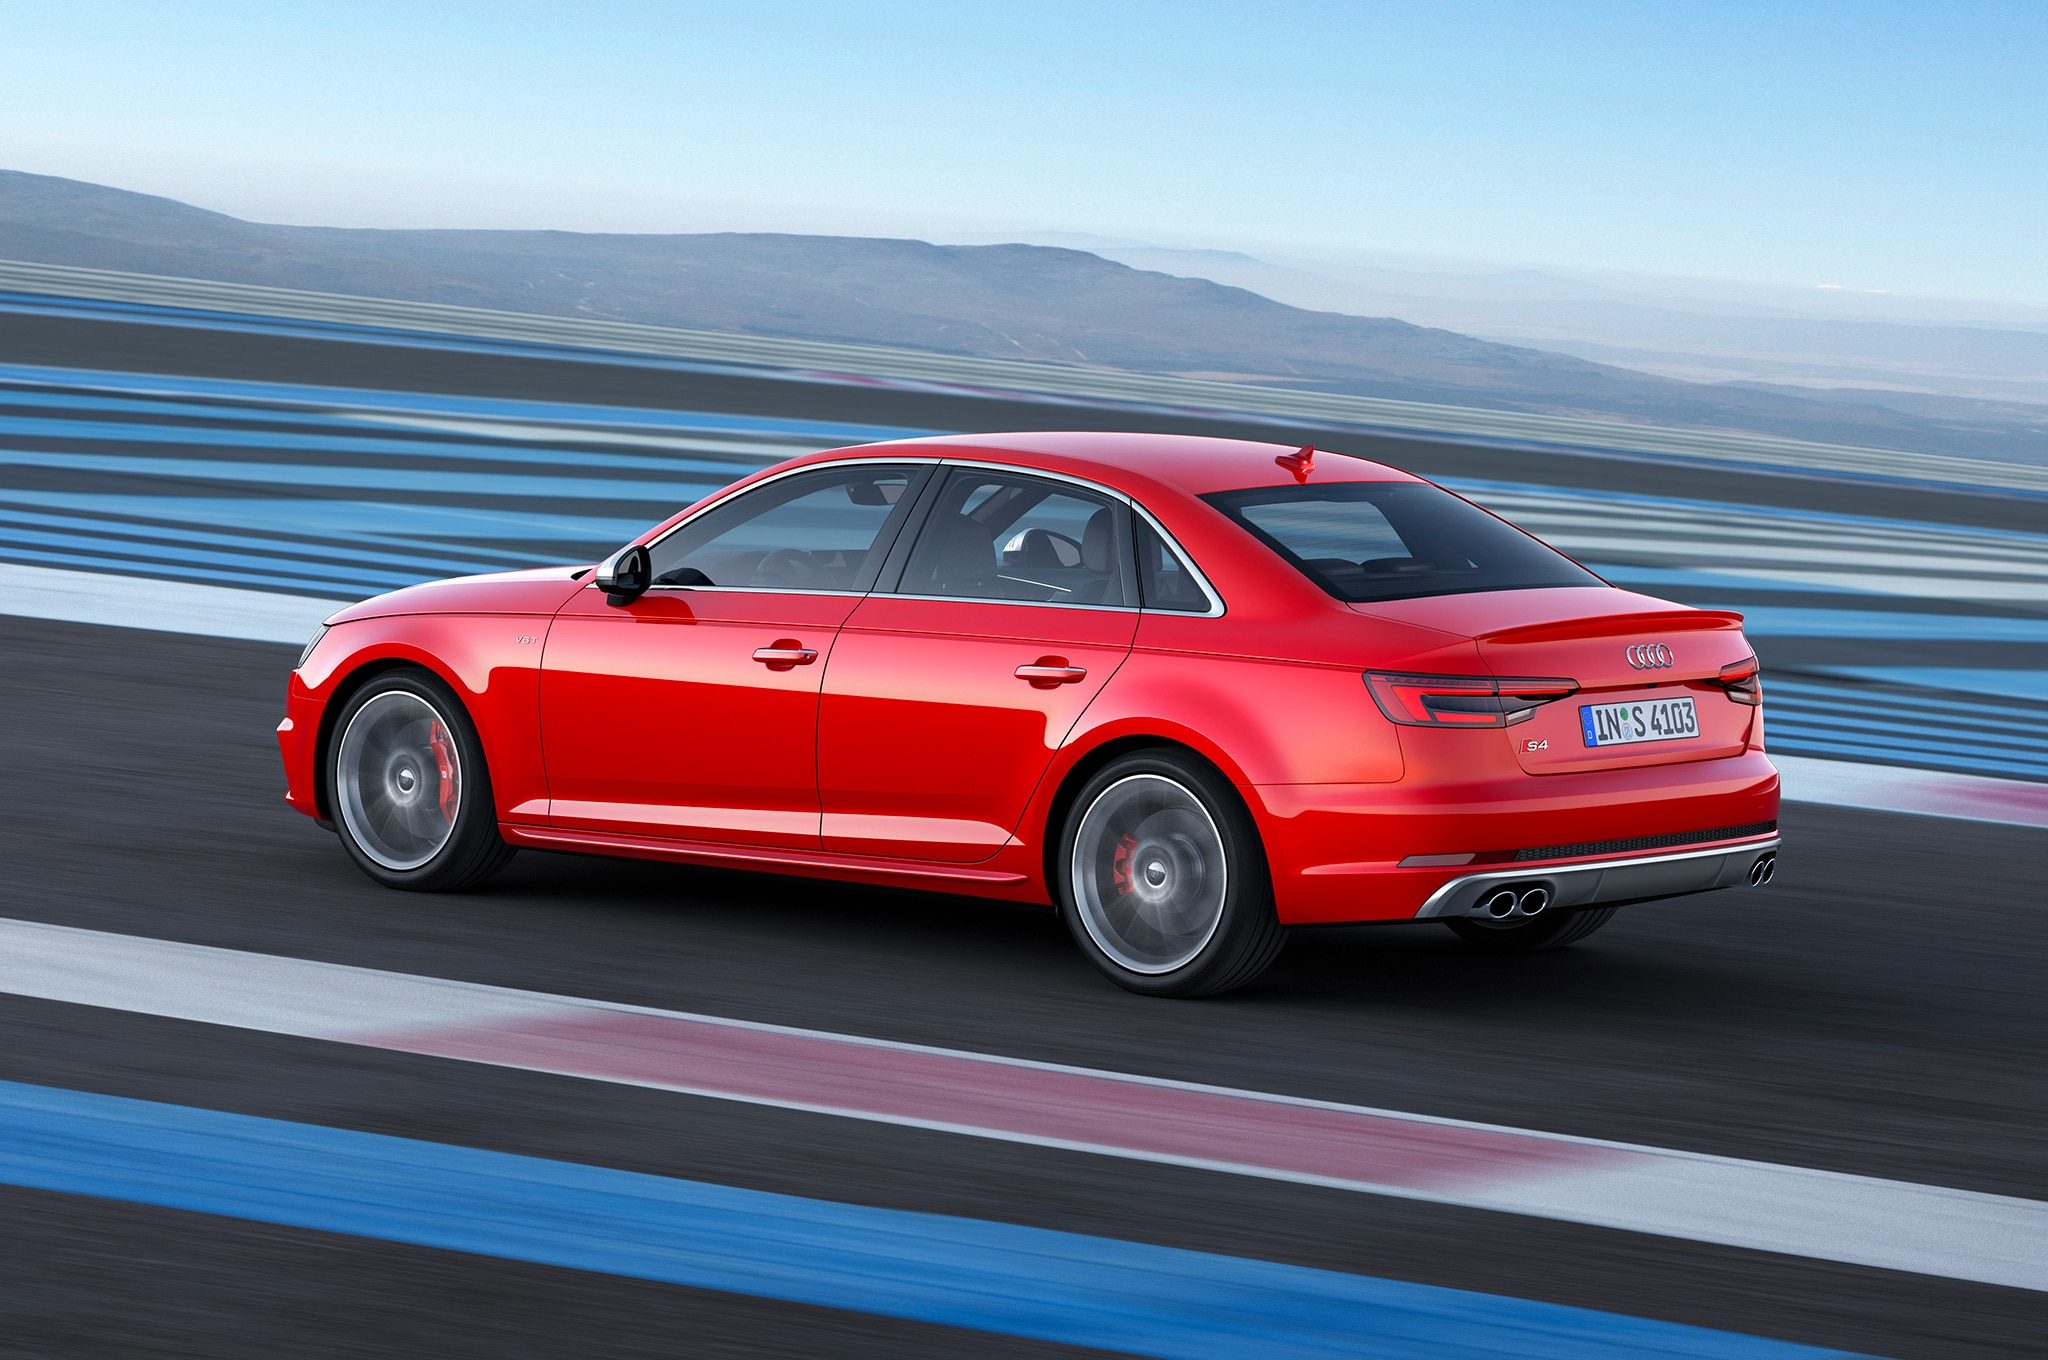 2017 Audi Rs4 Price